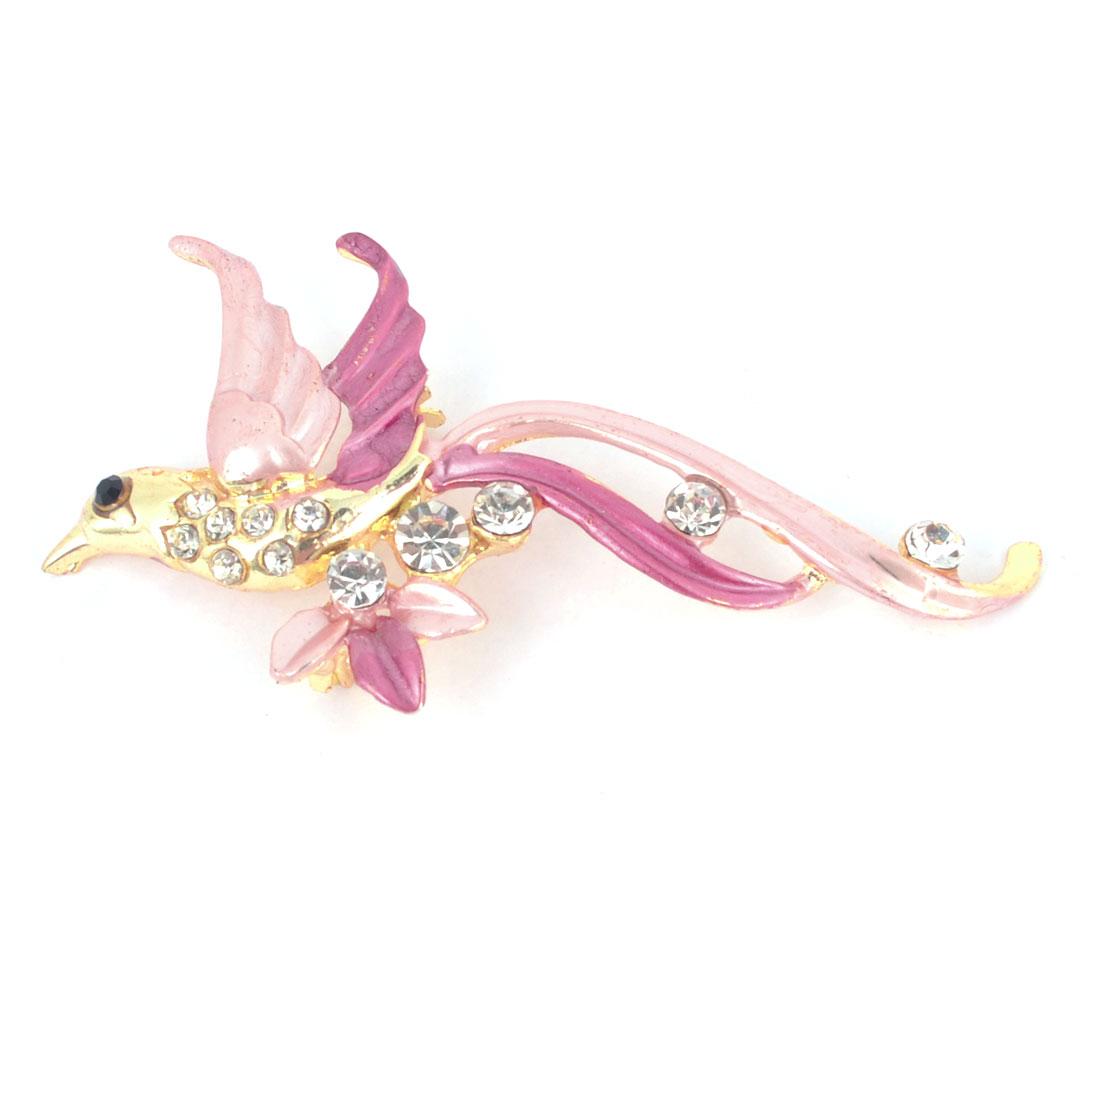 Lady Dress Adornment Rhinestone Detail Pink Fuchsia Bird Shaped Brooch Broach